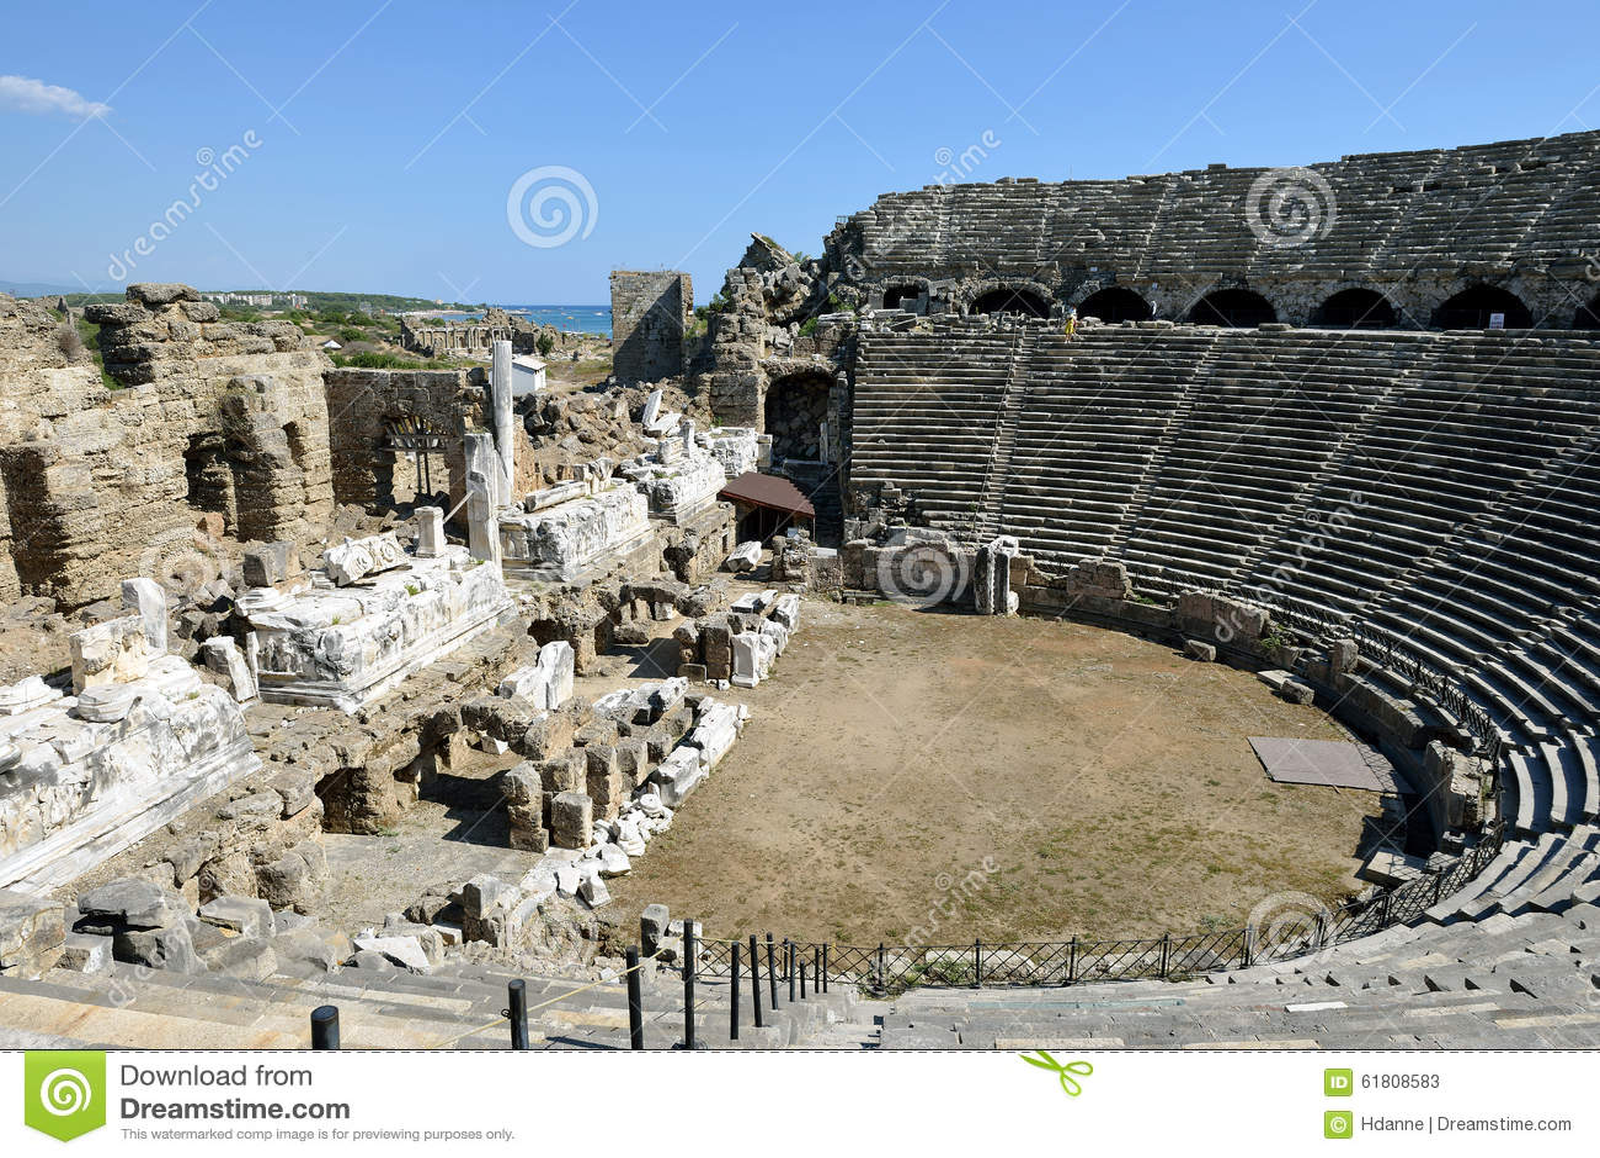 Greek Amphitheater, Side Editorial Stock Photo - Image ...